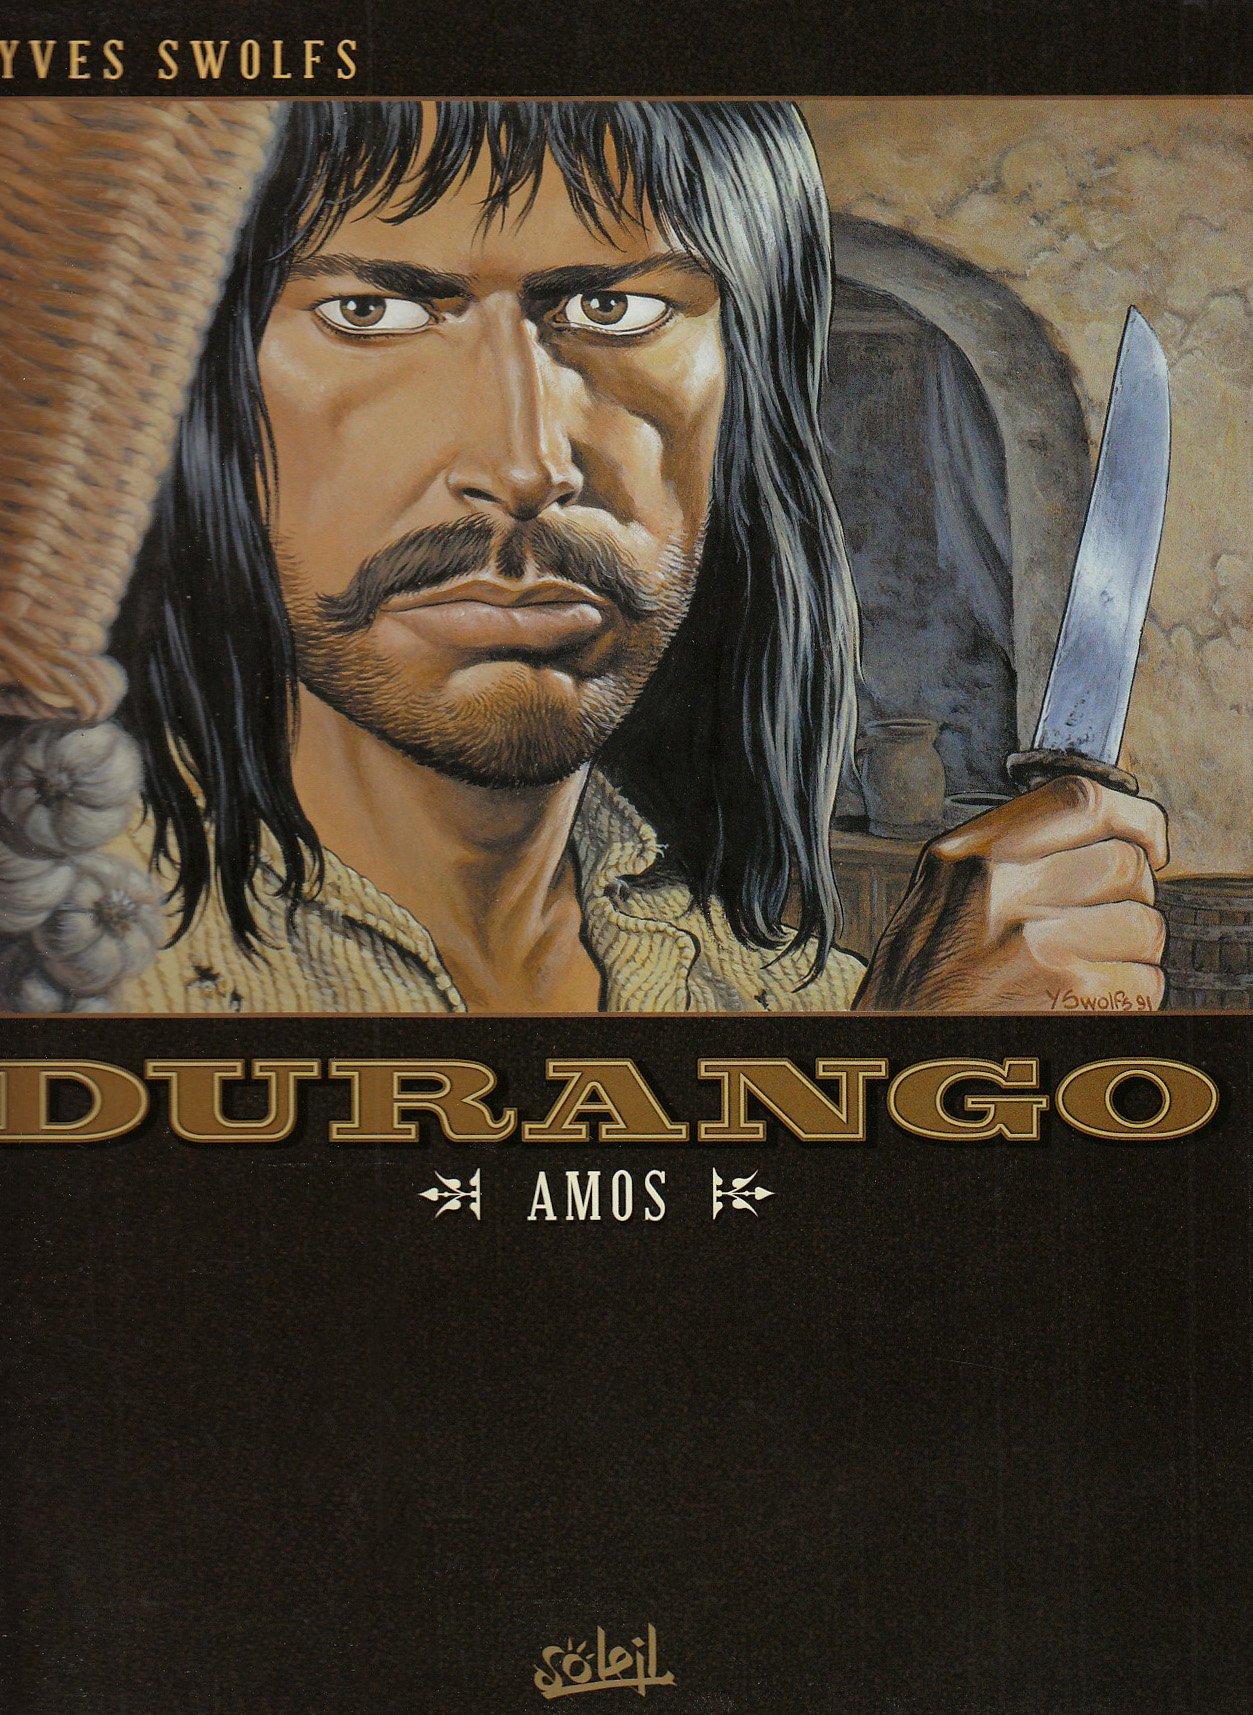 Durango, Tome 4 : Amos Album – 27 août 2008 Yves Swolfs Soleil Productions 2302001613 379782302001619